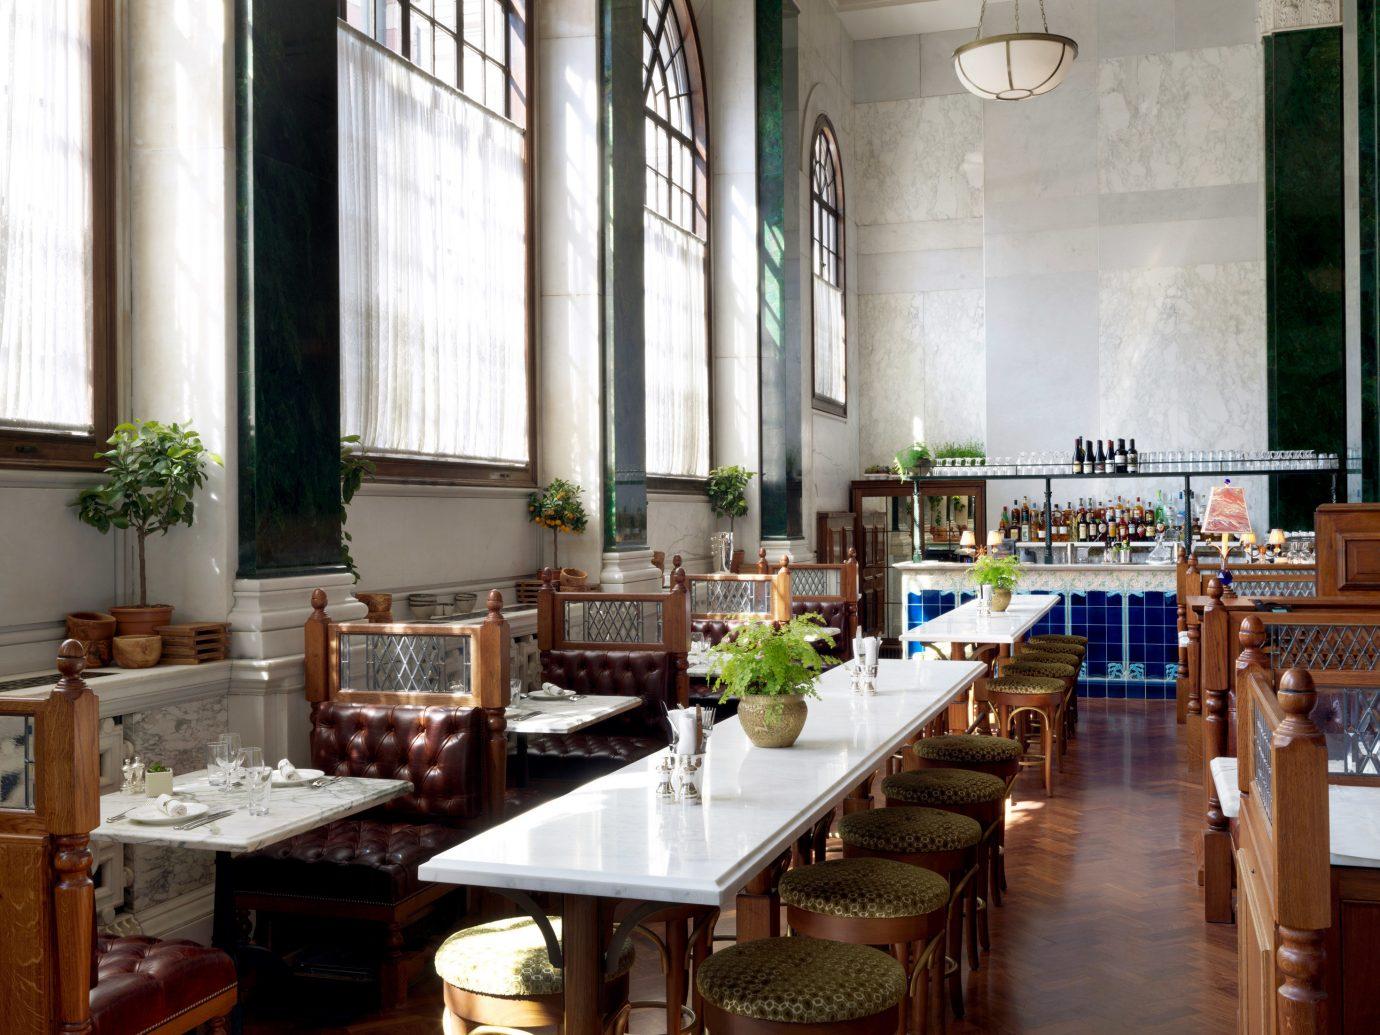 table indoor floor window room restaurant meal estate interior design counter furniture dining room